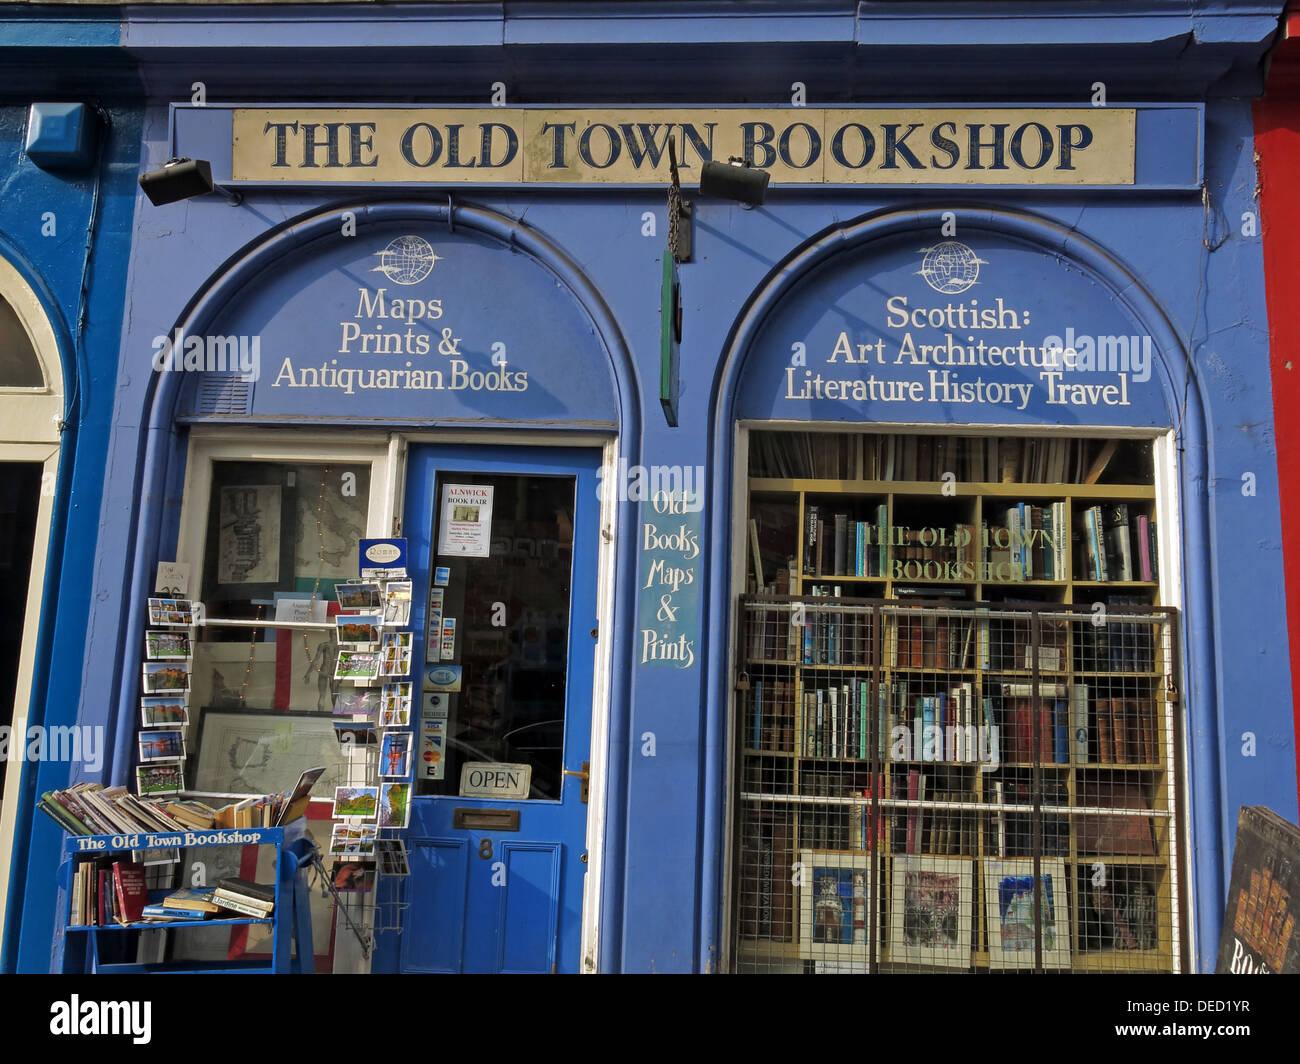 The old town bookshop Victoria Street Edinburgh Scotland UK - Stock Image